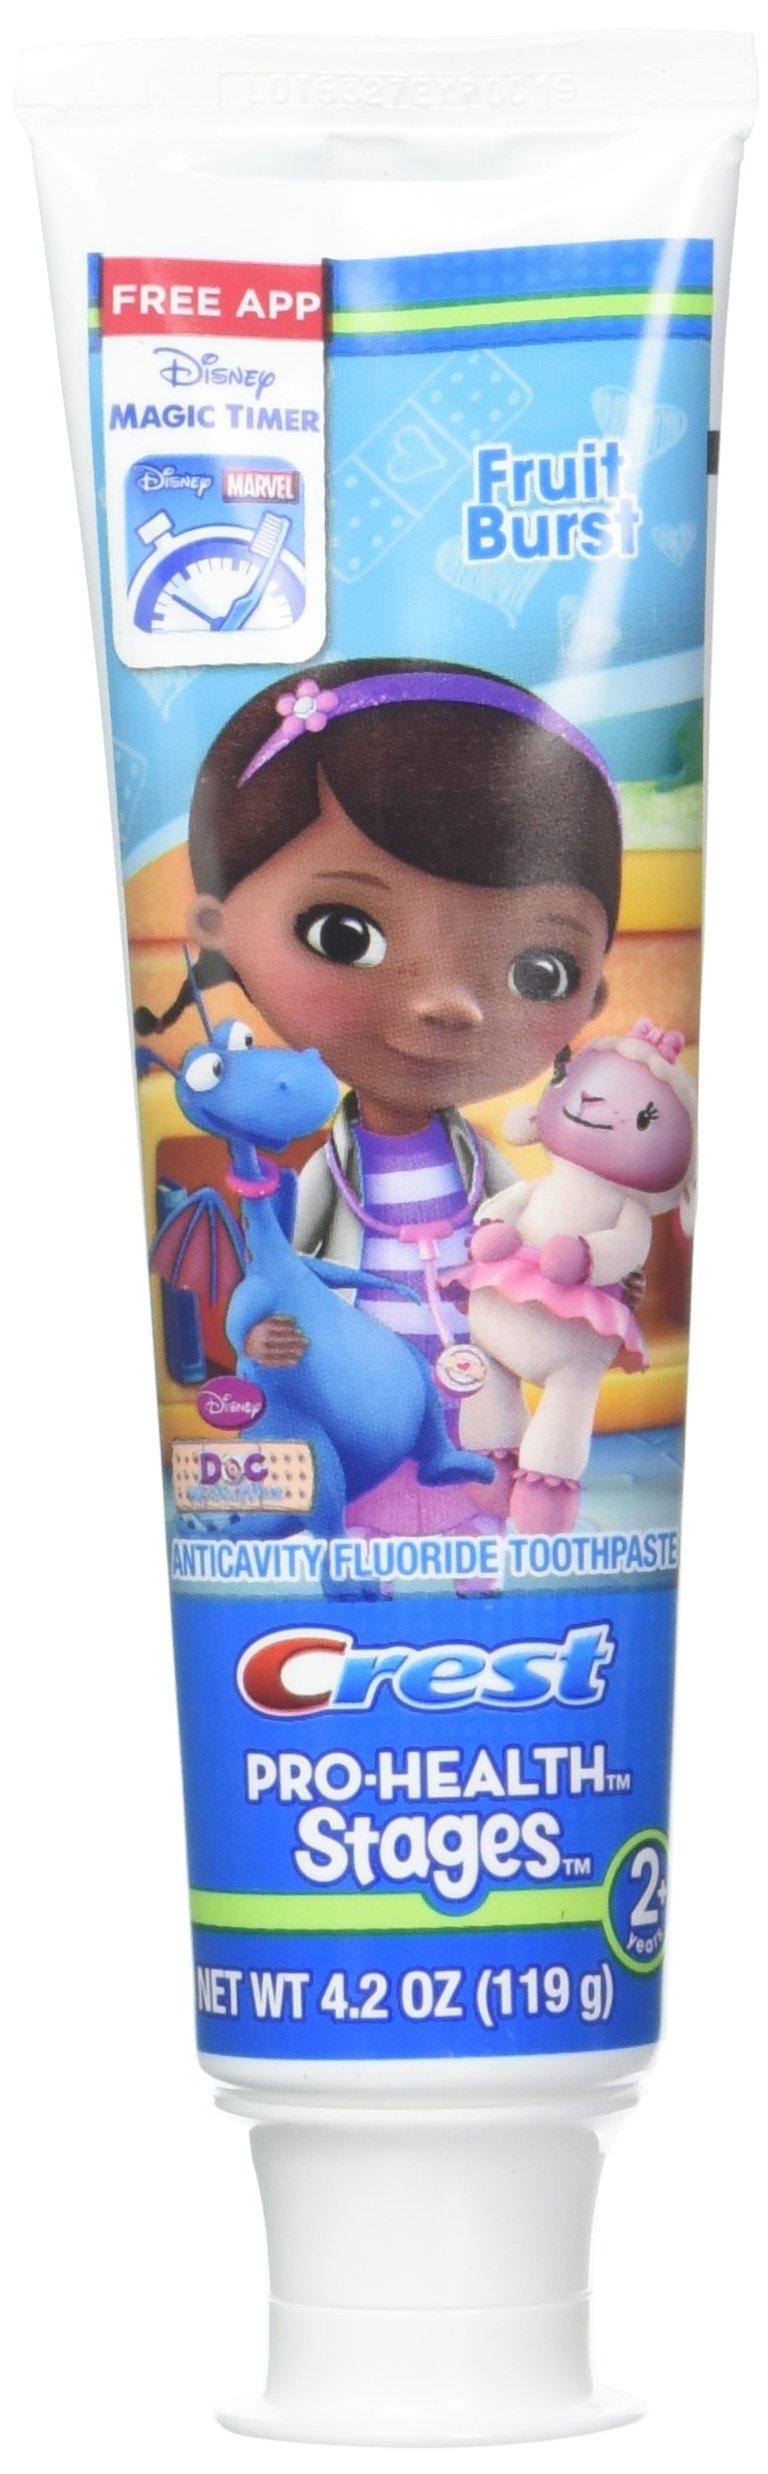 Crest Pro-Health Disney Jr. Doc Mcstuffins Stages 2+ Fruit Burst 4.2oz (Pack of 2) Plus one Free Oral-B Complete Toothbrush